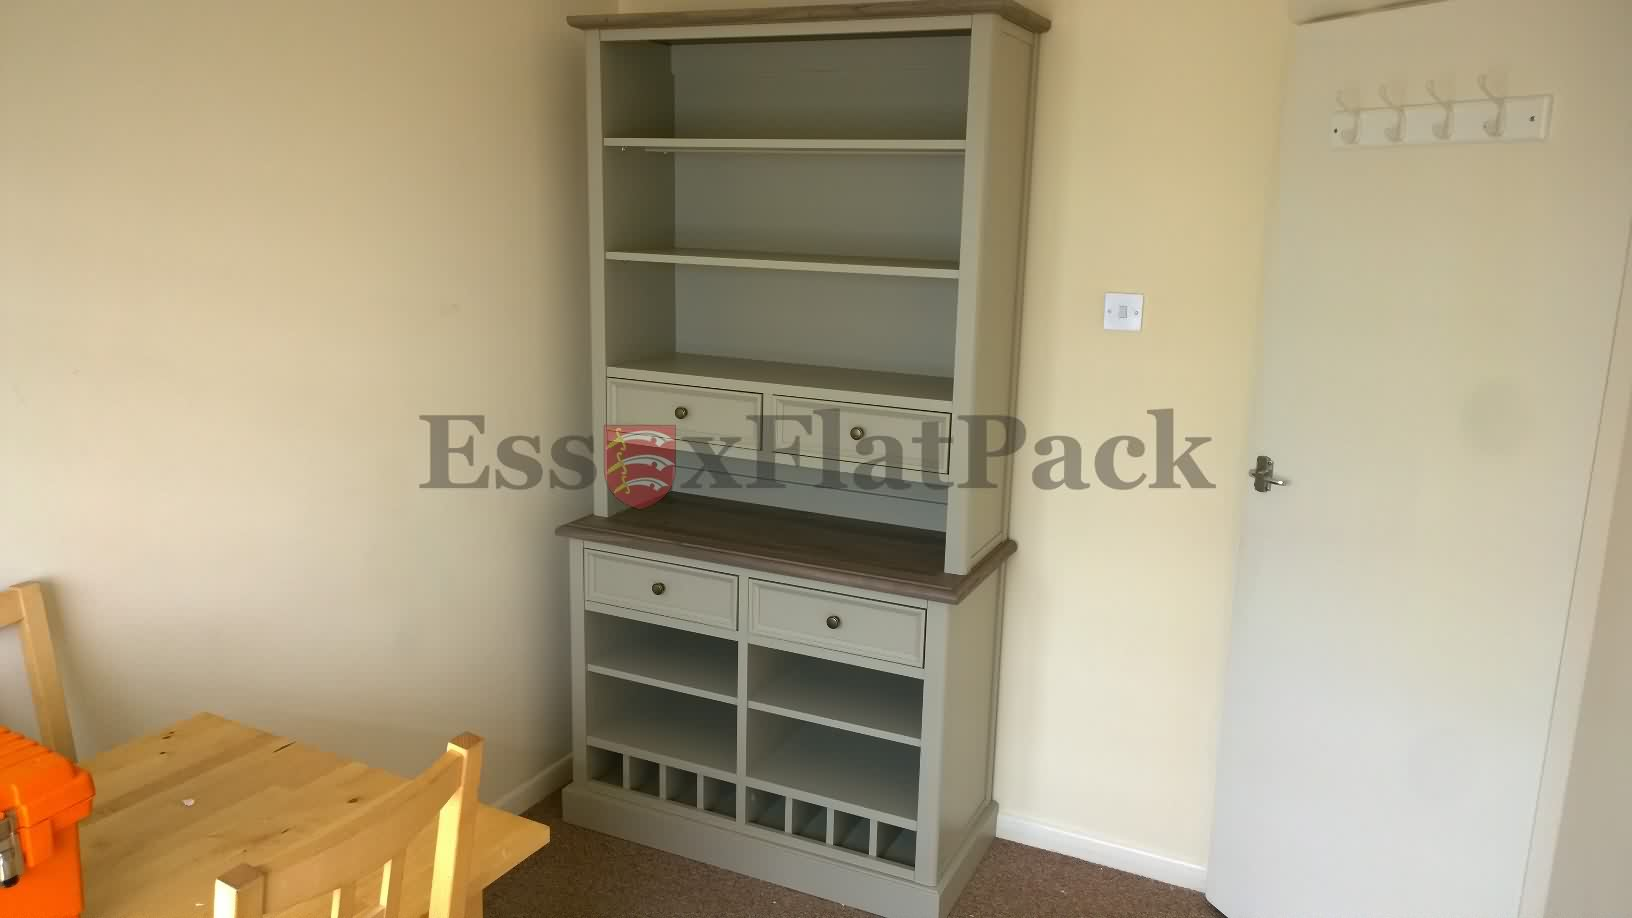 essexflatpack-furniture-20160623130933.jpg